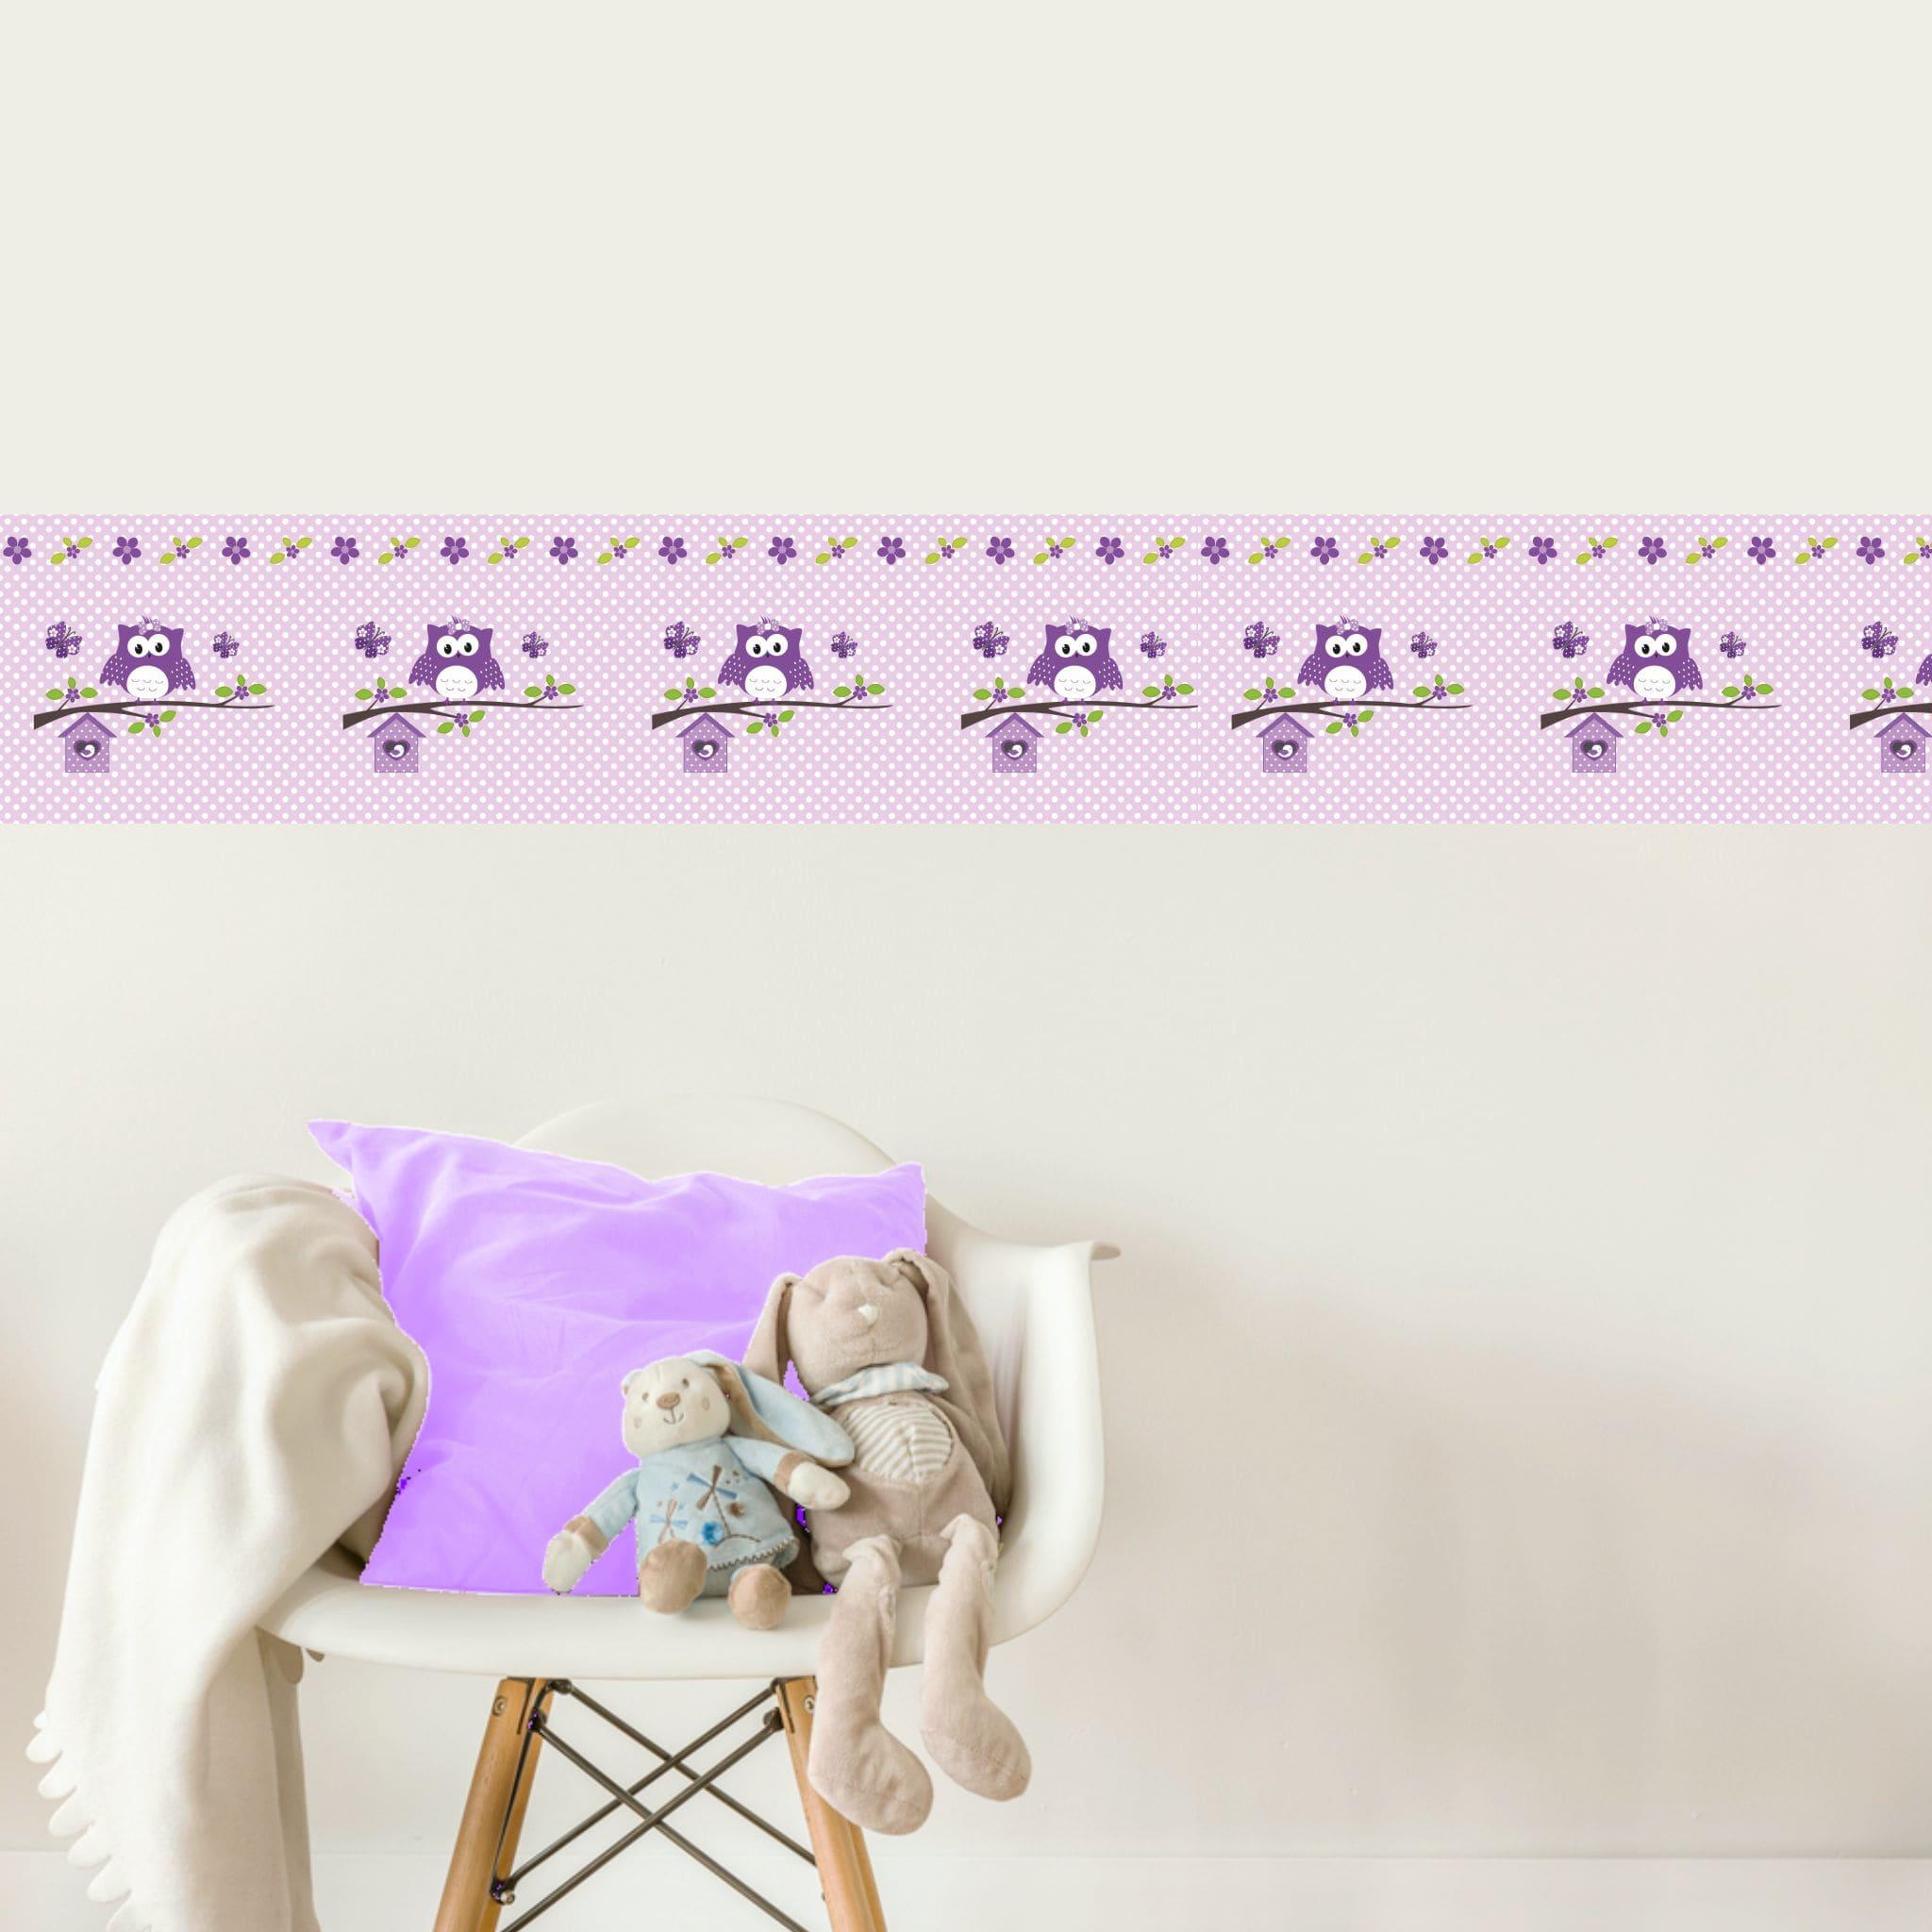 Vlies Bordüre selbstklebend für Kinderzimmer Happy Eule lila ...